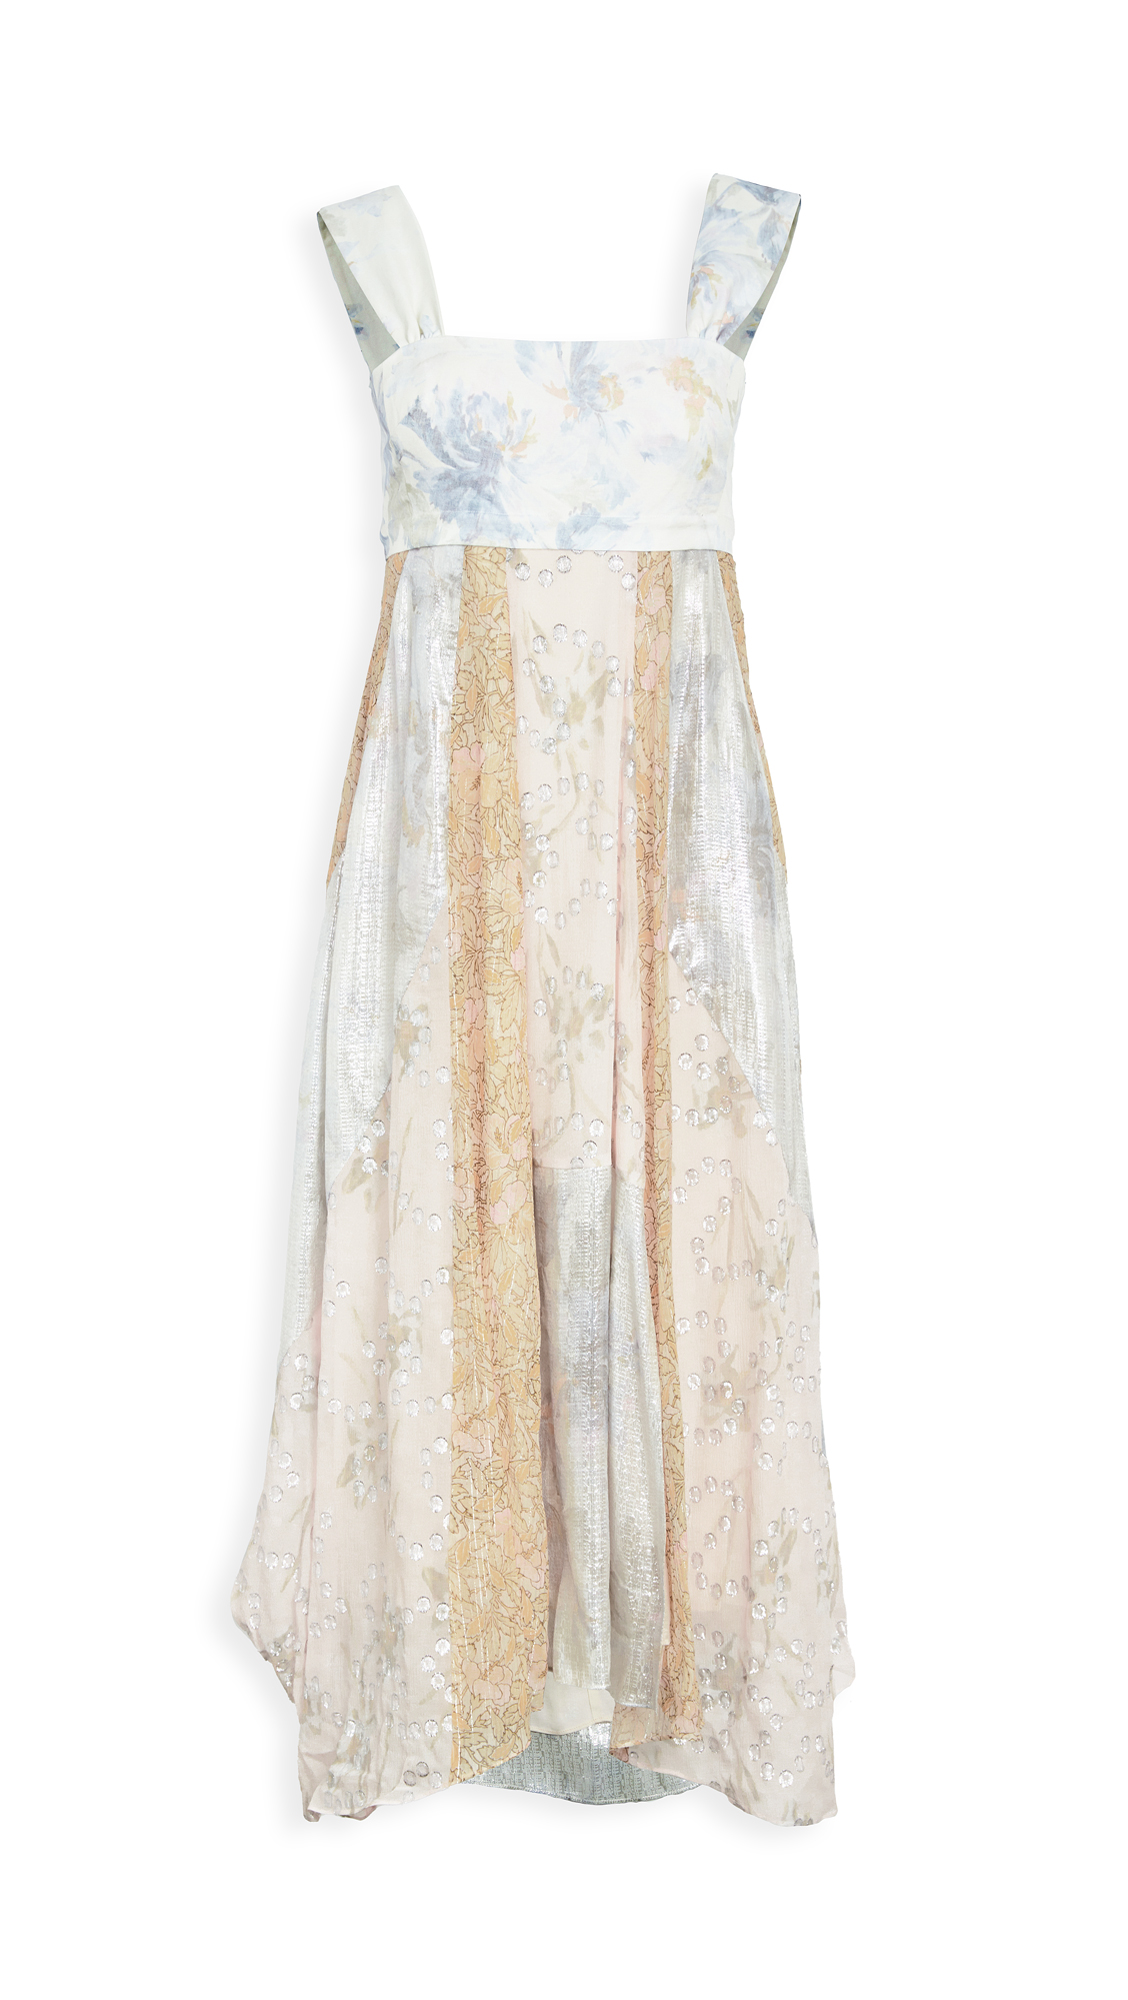 Rebecca Taylor Sleeveless Daffodil Dress - 40% Off Sale